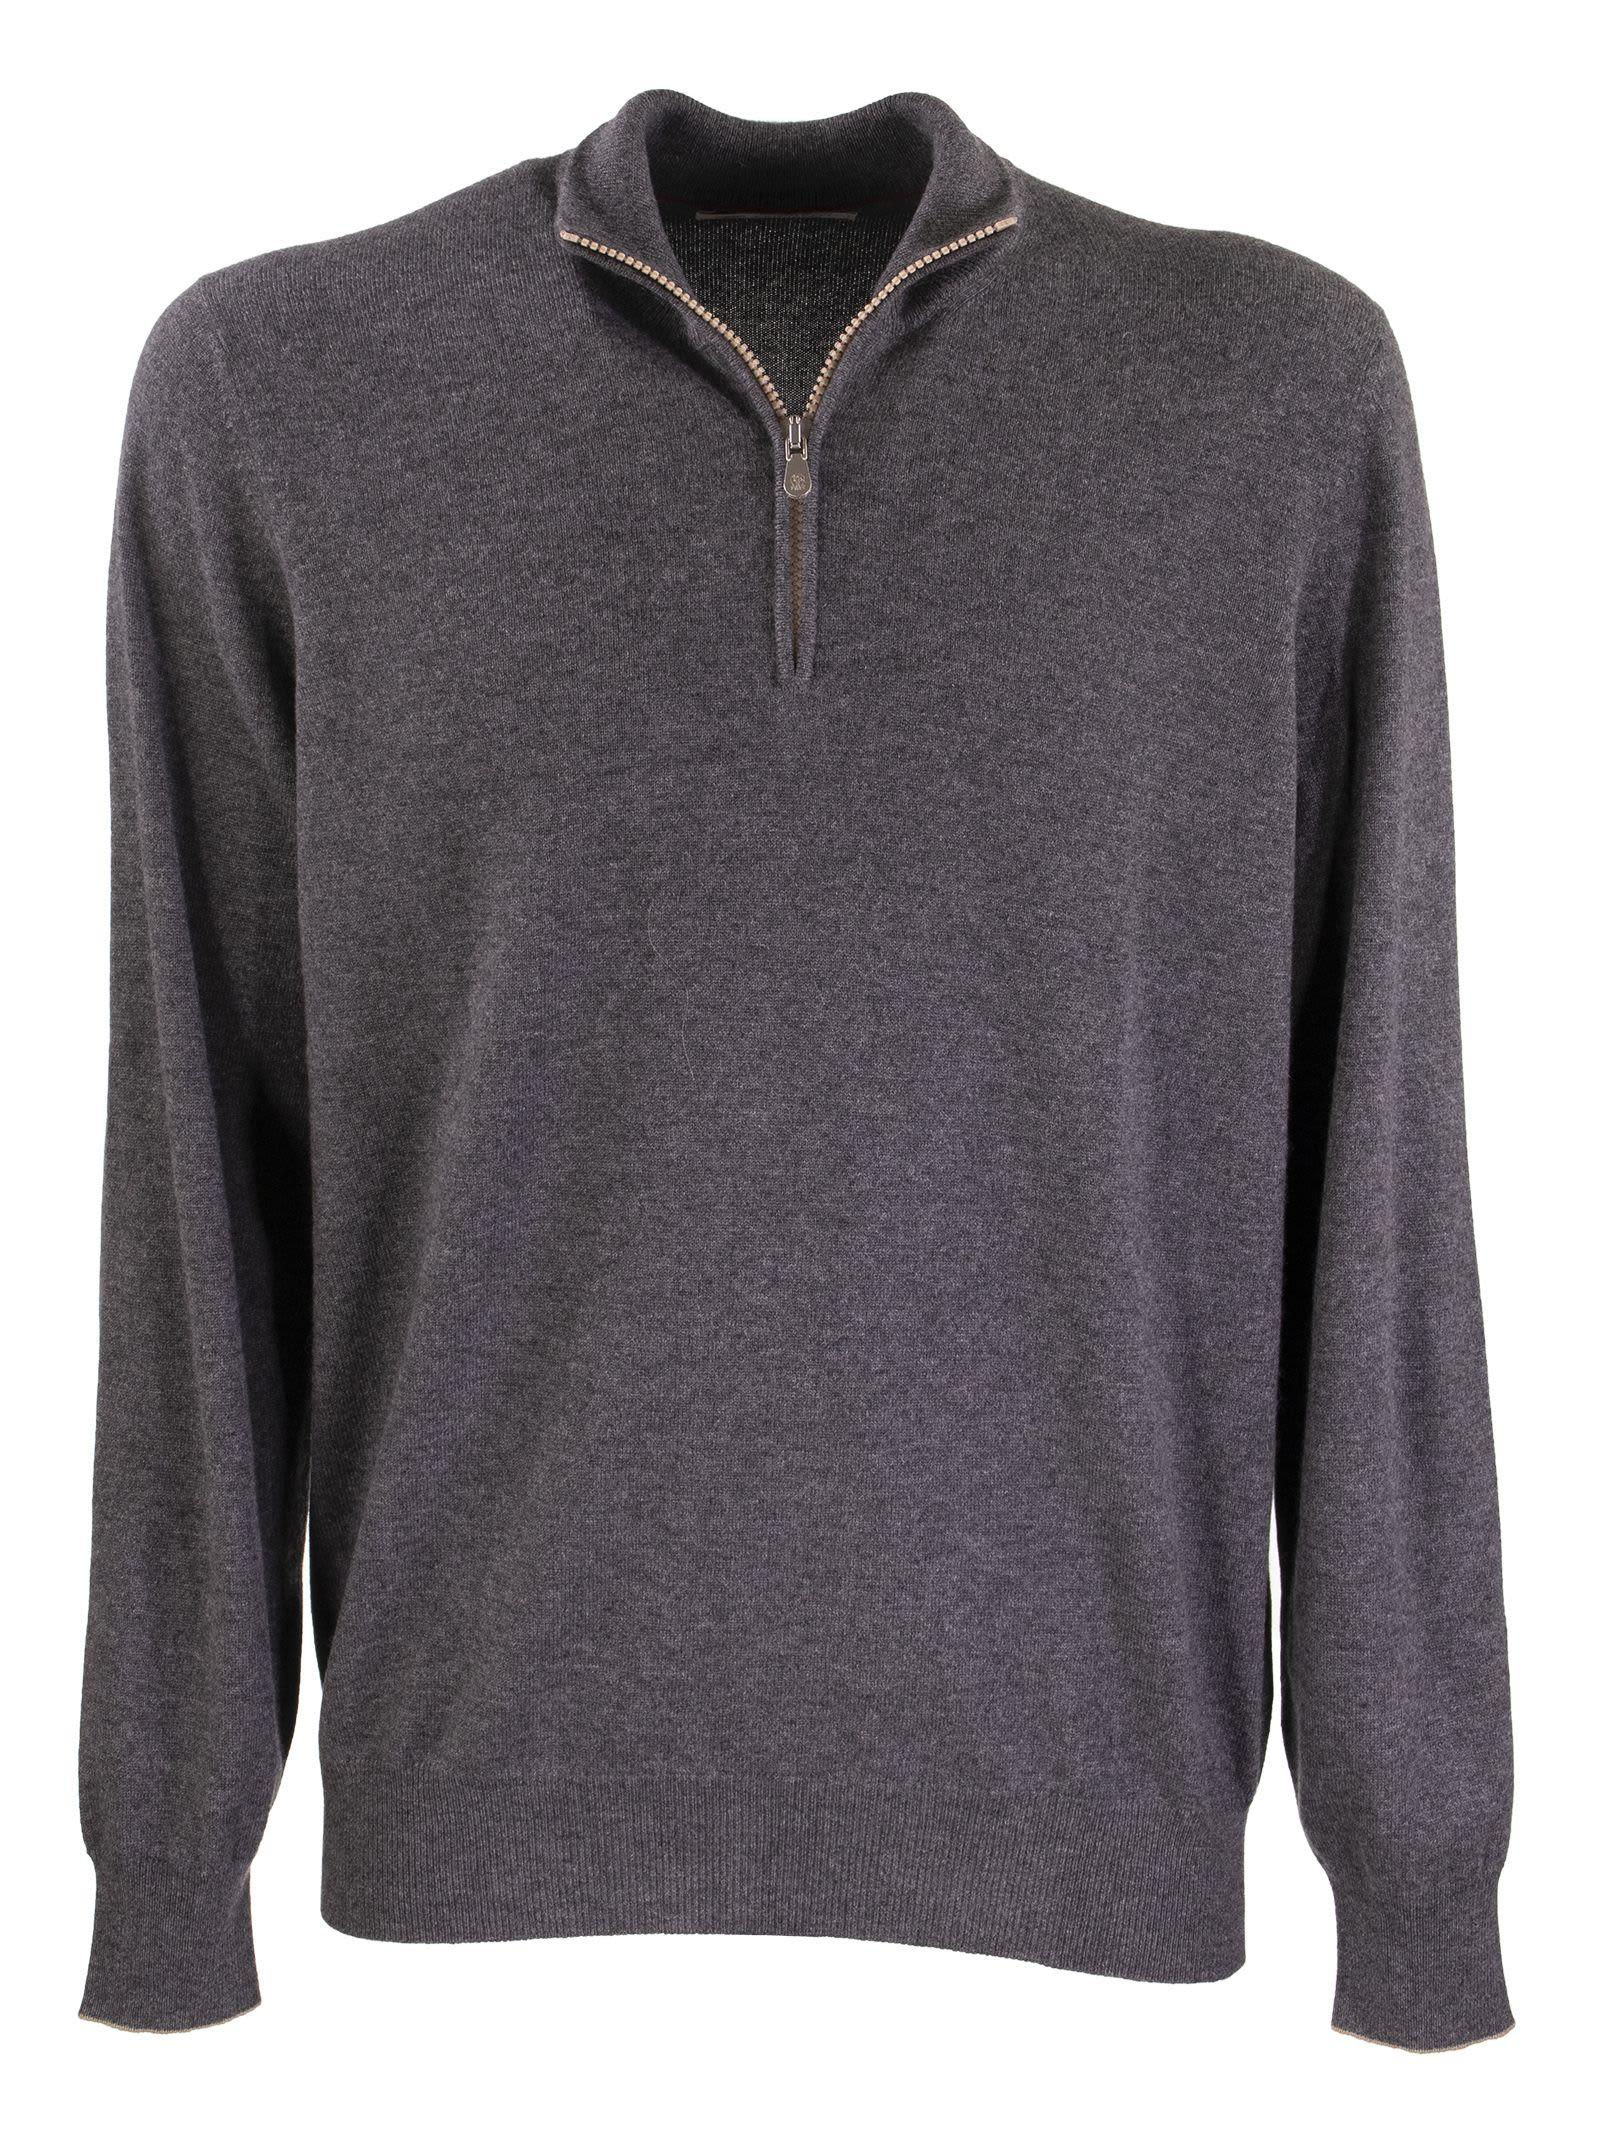 Brunello Cucinelli High Neck Sweater Cashmere Turtleneck Sweater With Zipper